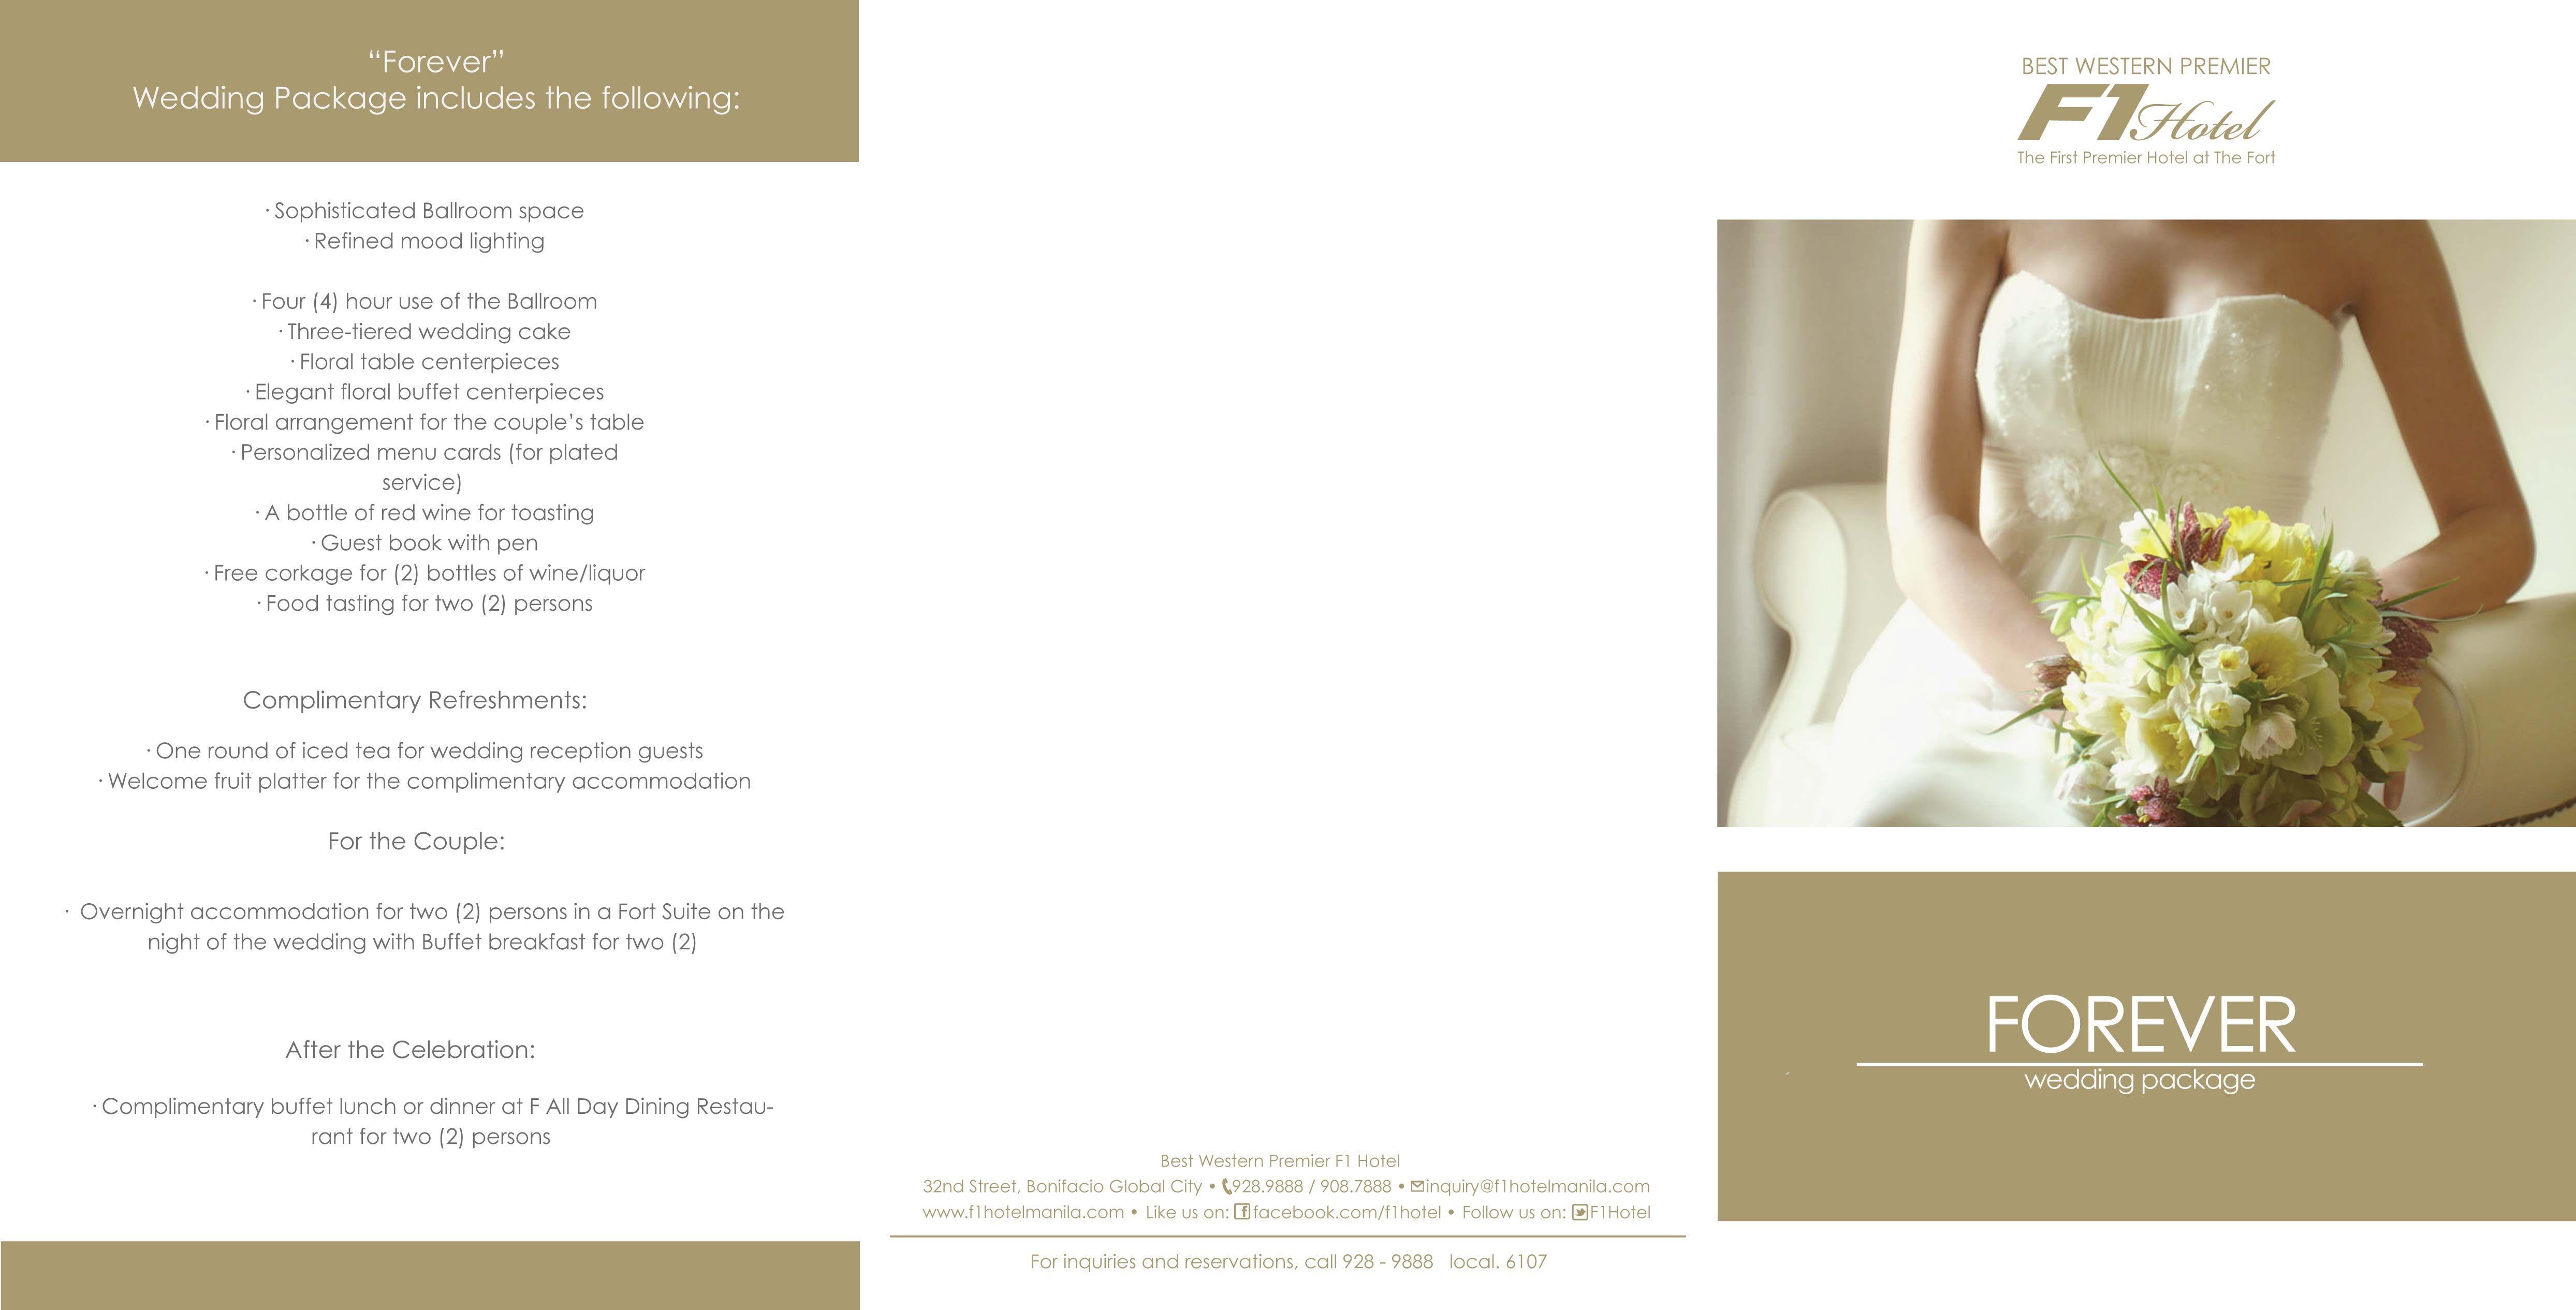 Wedding Package Brochure | Best Western Premier - F1 Hotel ...